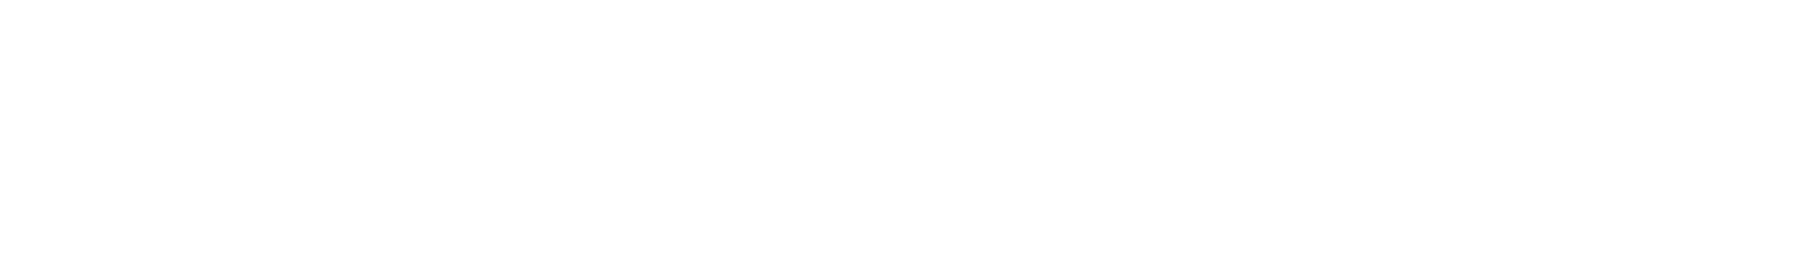 reverse guitar